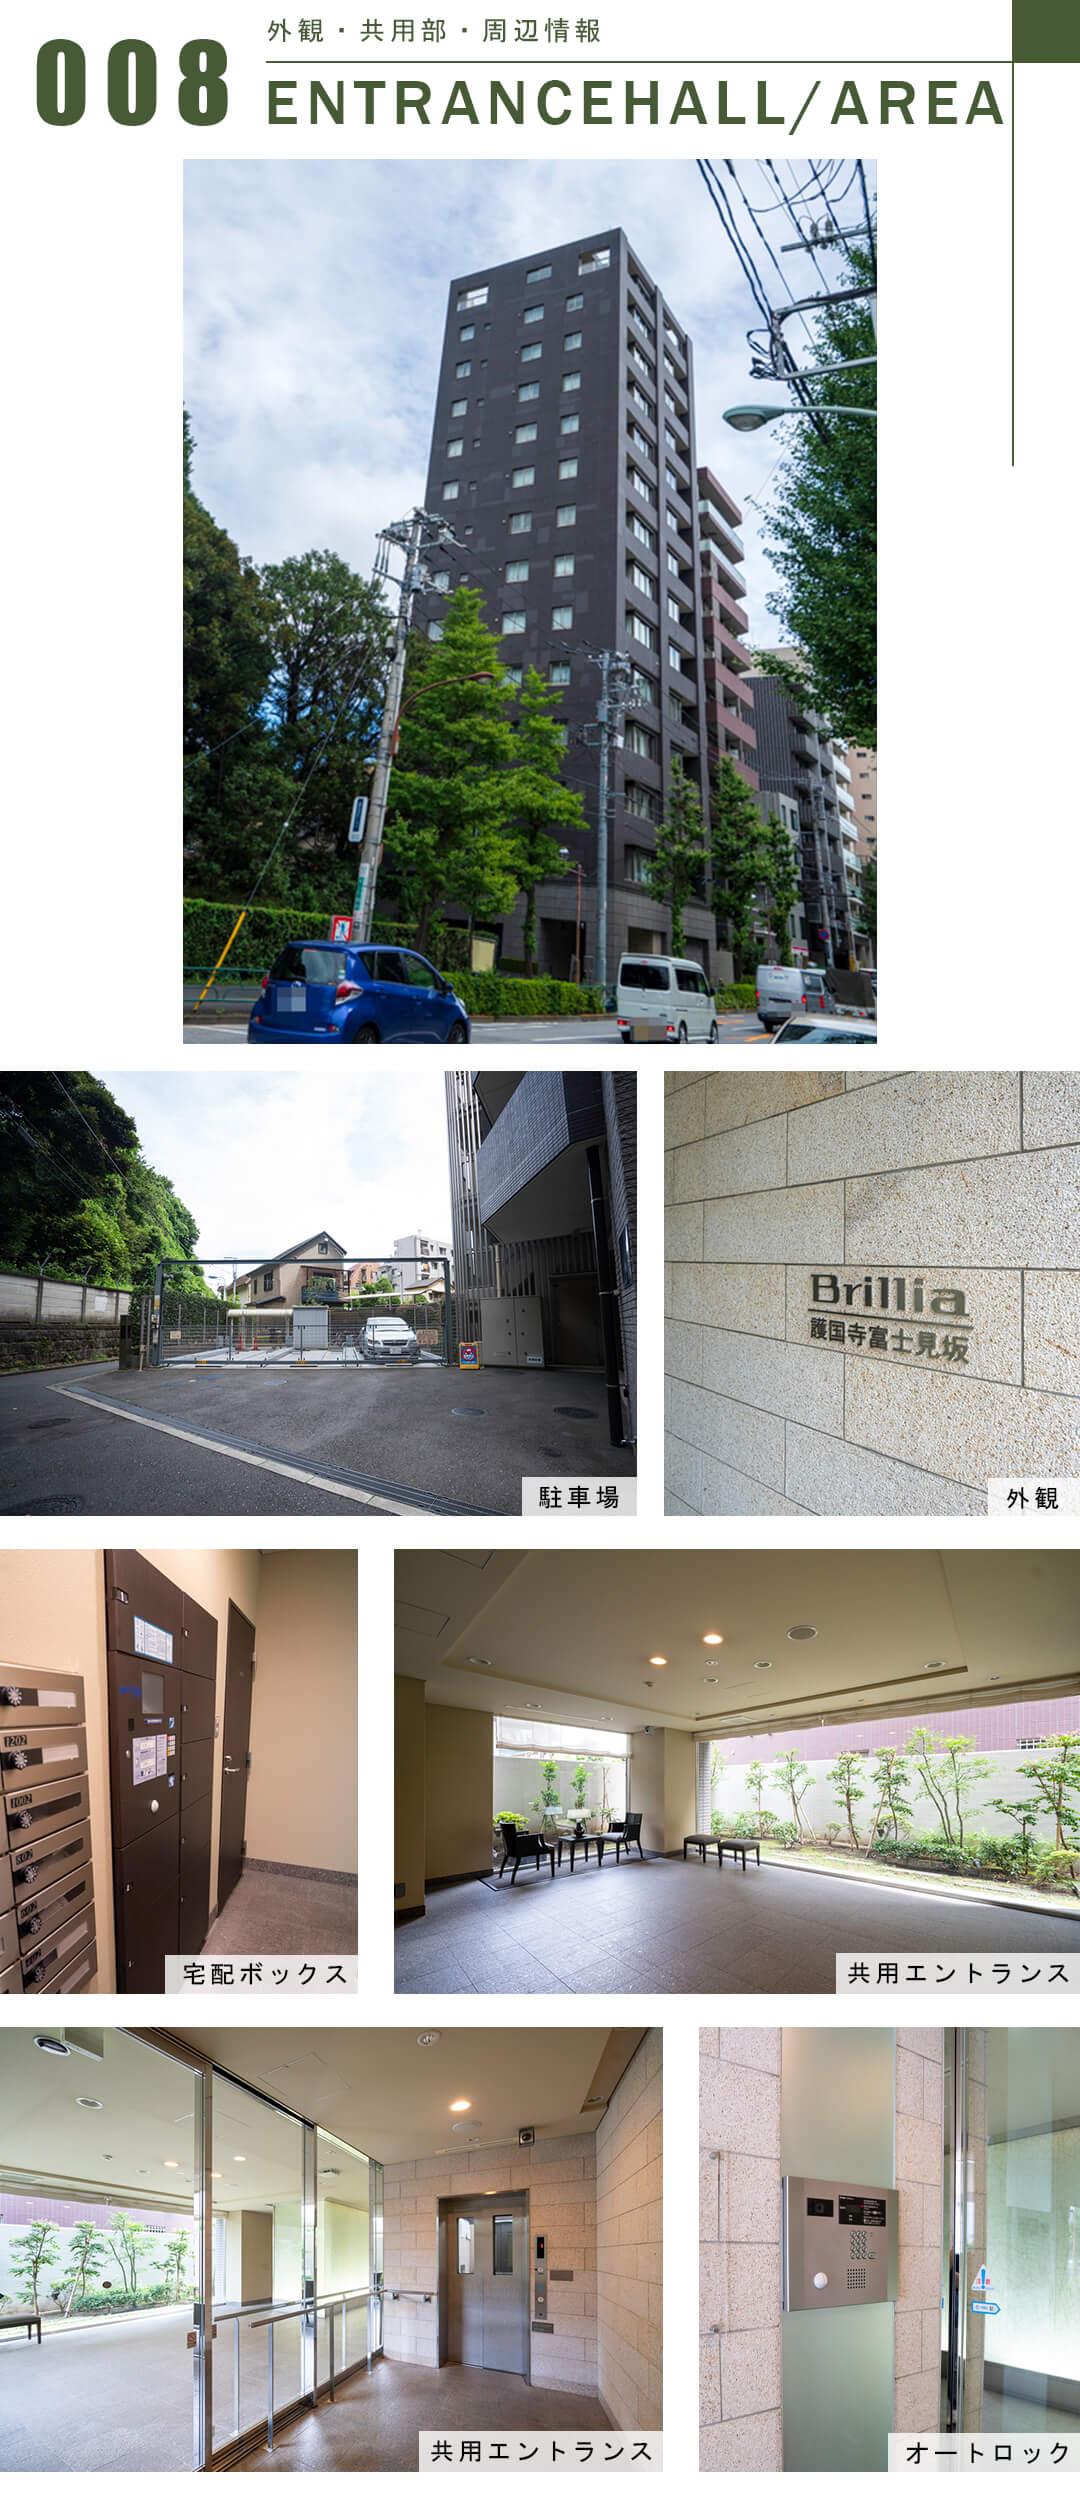 Brillia護国寺富士見坂の外観と共用部と周辺情報